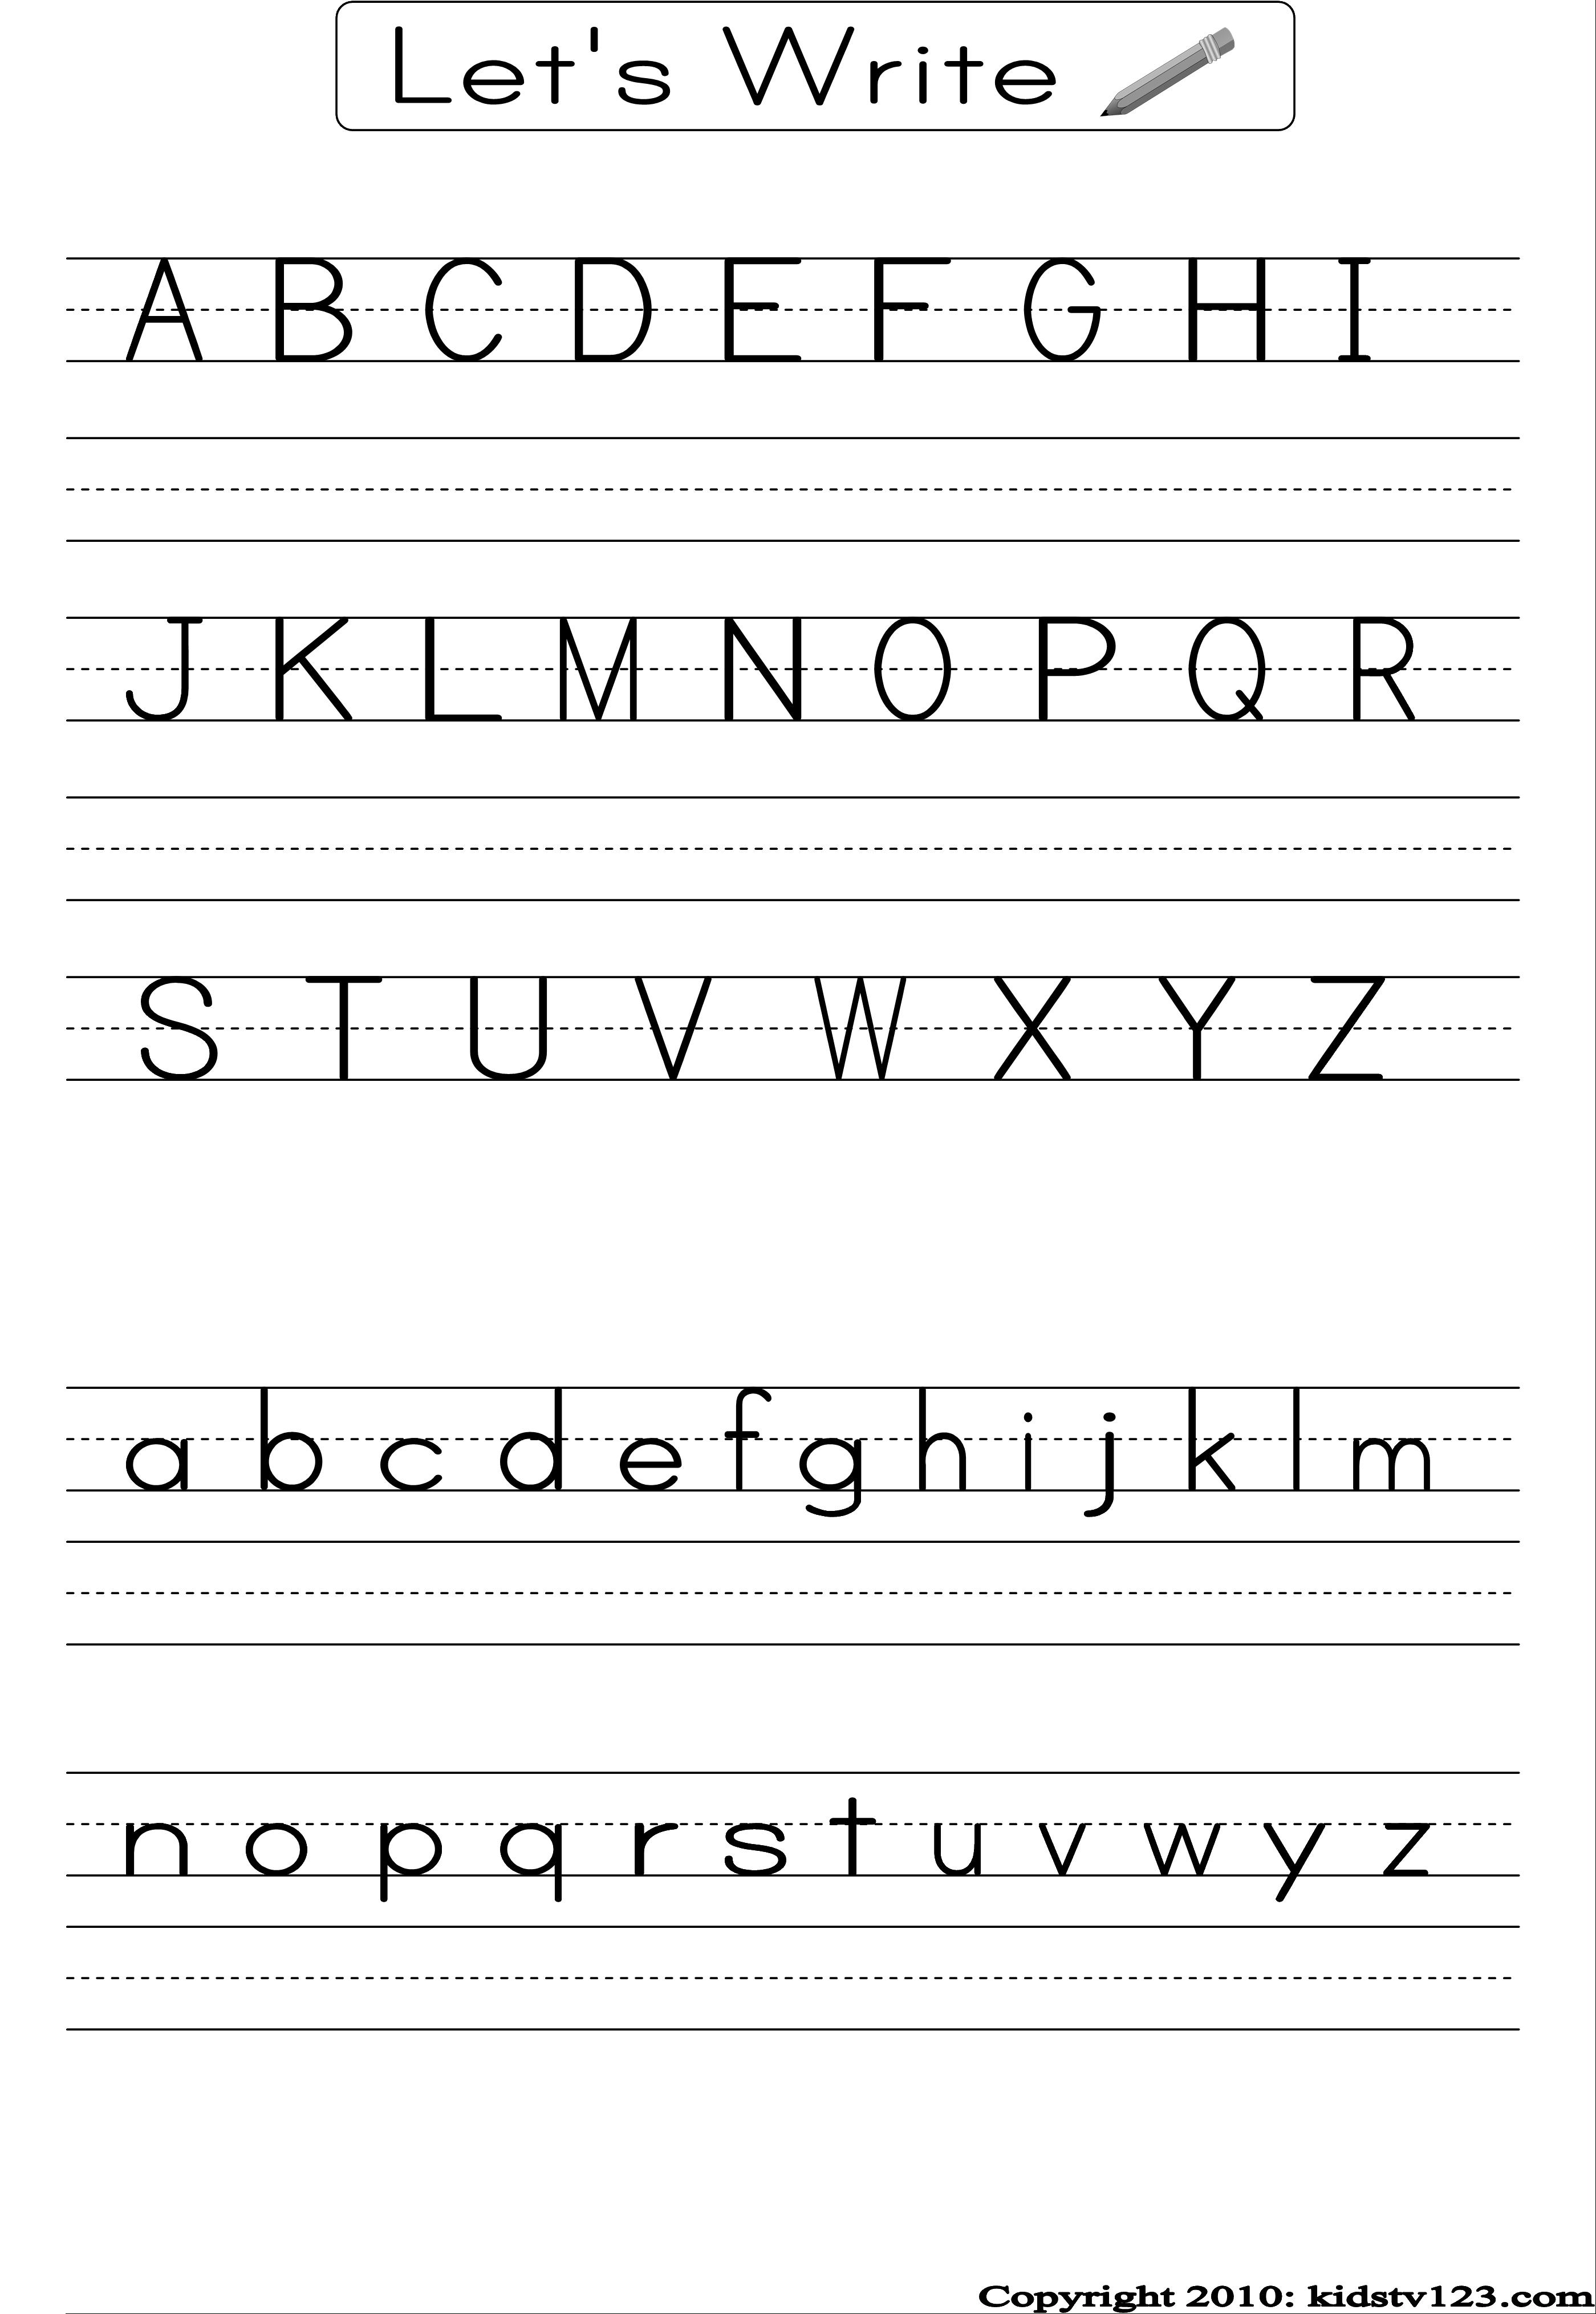 Free Printable Alphabet Worksheets, Preschool Writing And Pattern - Free Printable Abc Worksheets